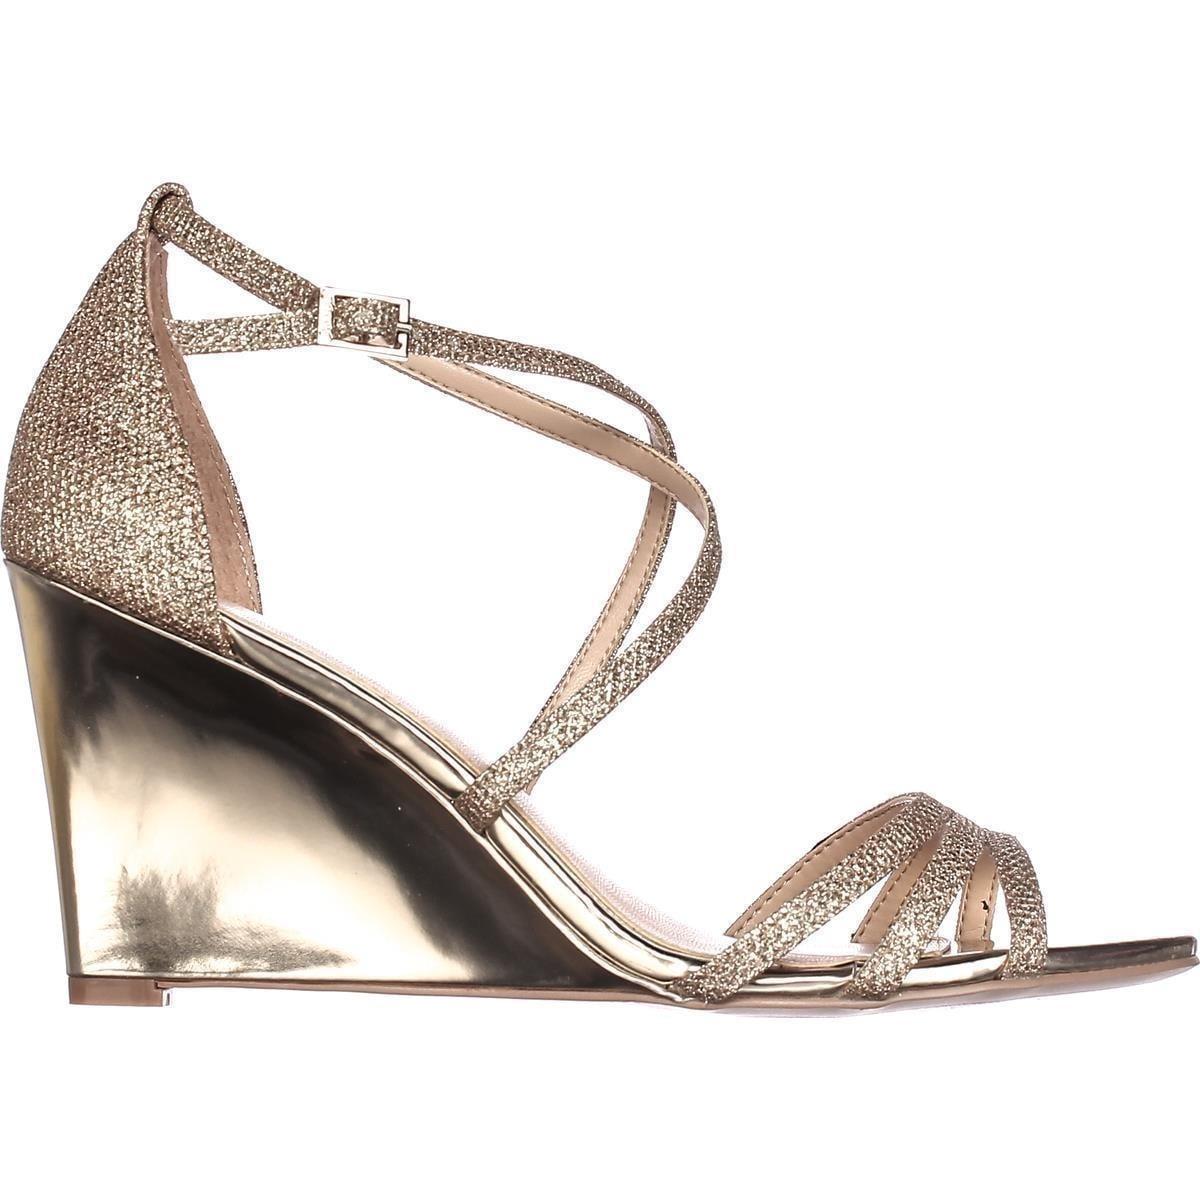 5b427ae5e0da Shop Jewel Badgley Mischka Hunt Strappy Wedge Sandals, Gold Glitter - Free  Shipping Today - Overstock - 18694203